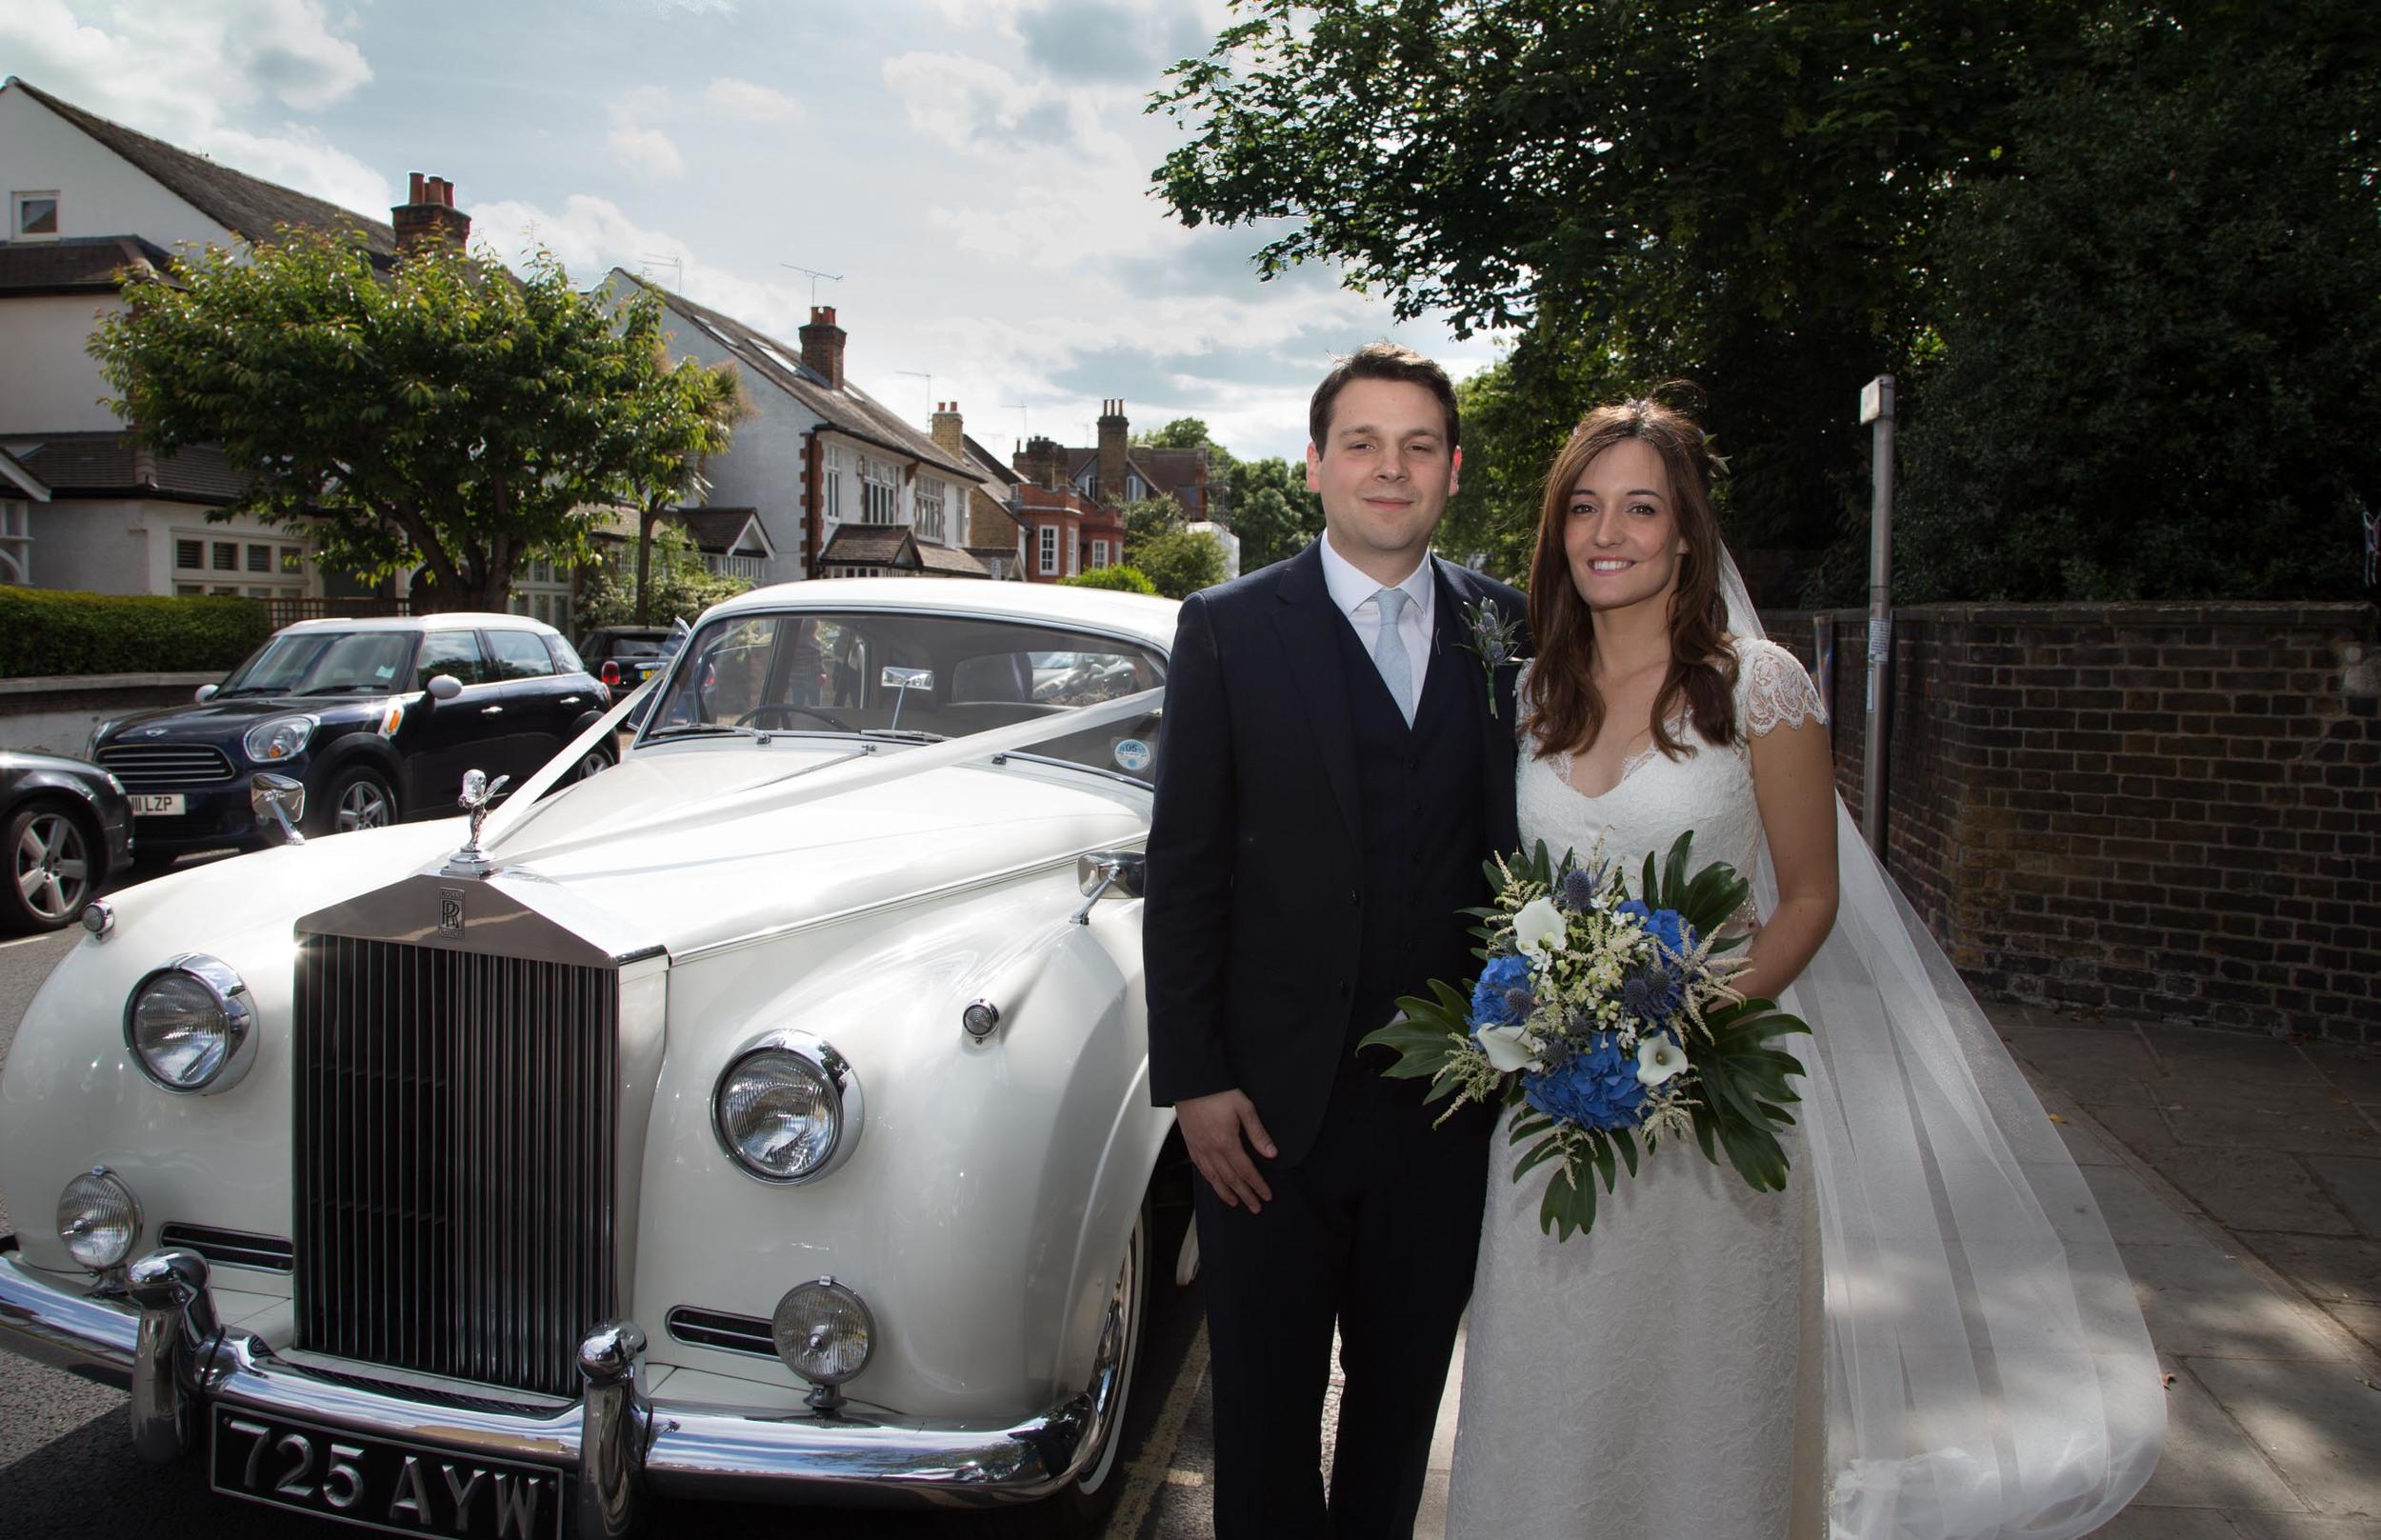 barnes-wedding-adam-rowley-photographer-rolls-royce-st-mary's-church